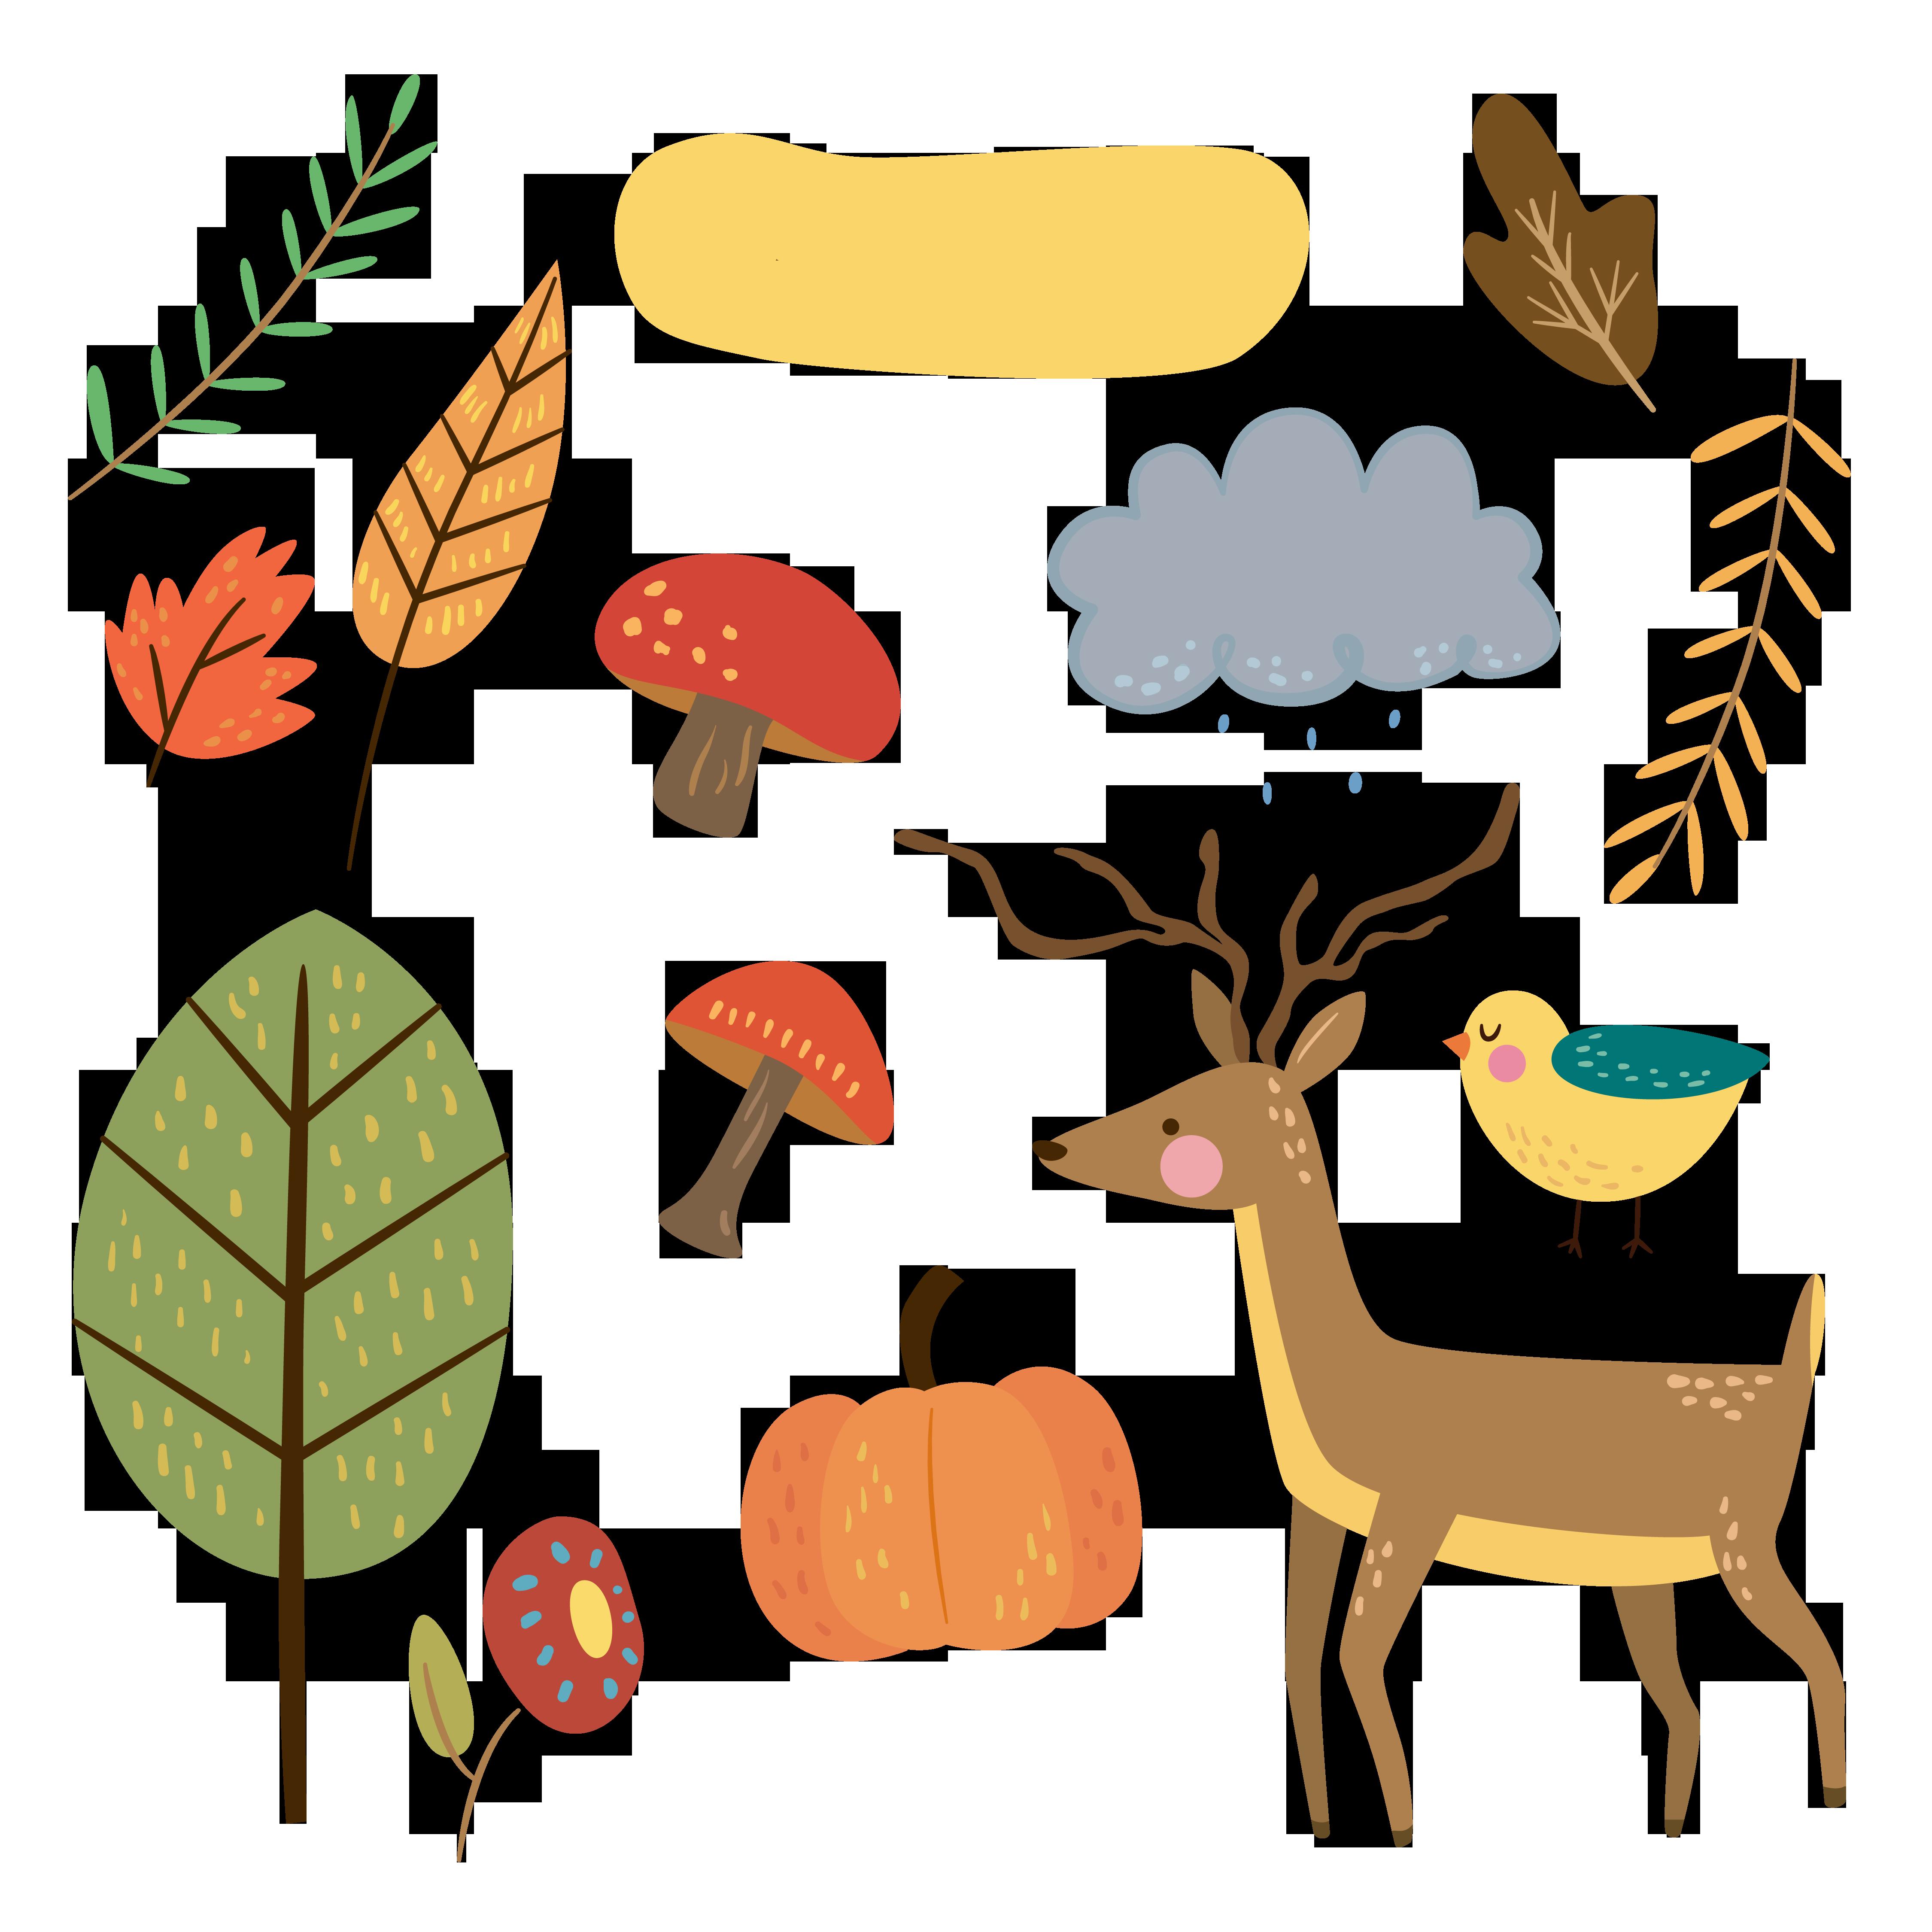 4500x4500 Free Cute Animal Autumn Clipart Fptfy 2.png Pixels